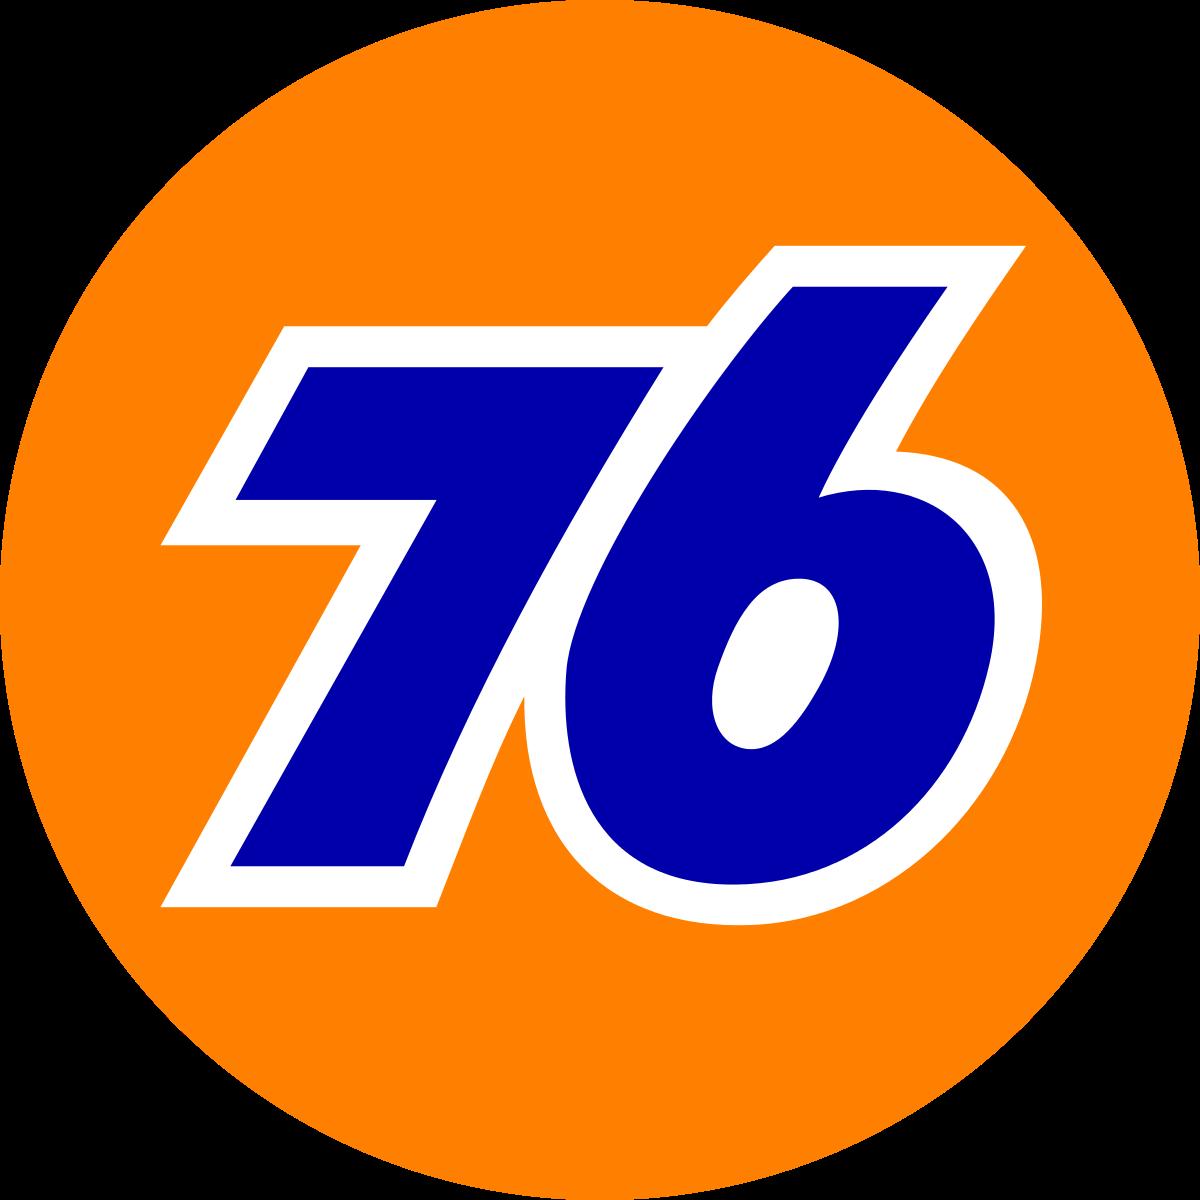 76 Logo Gas Station Gas Station Old Gas Stations Logos